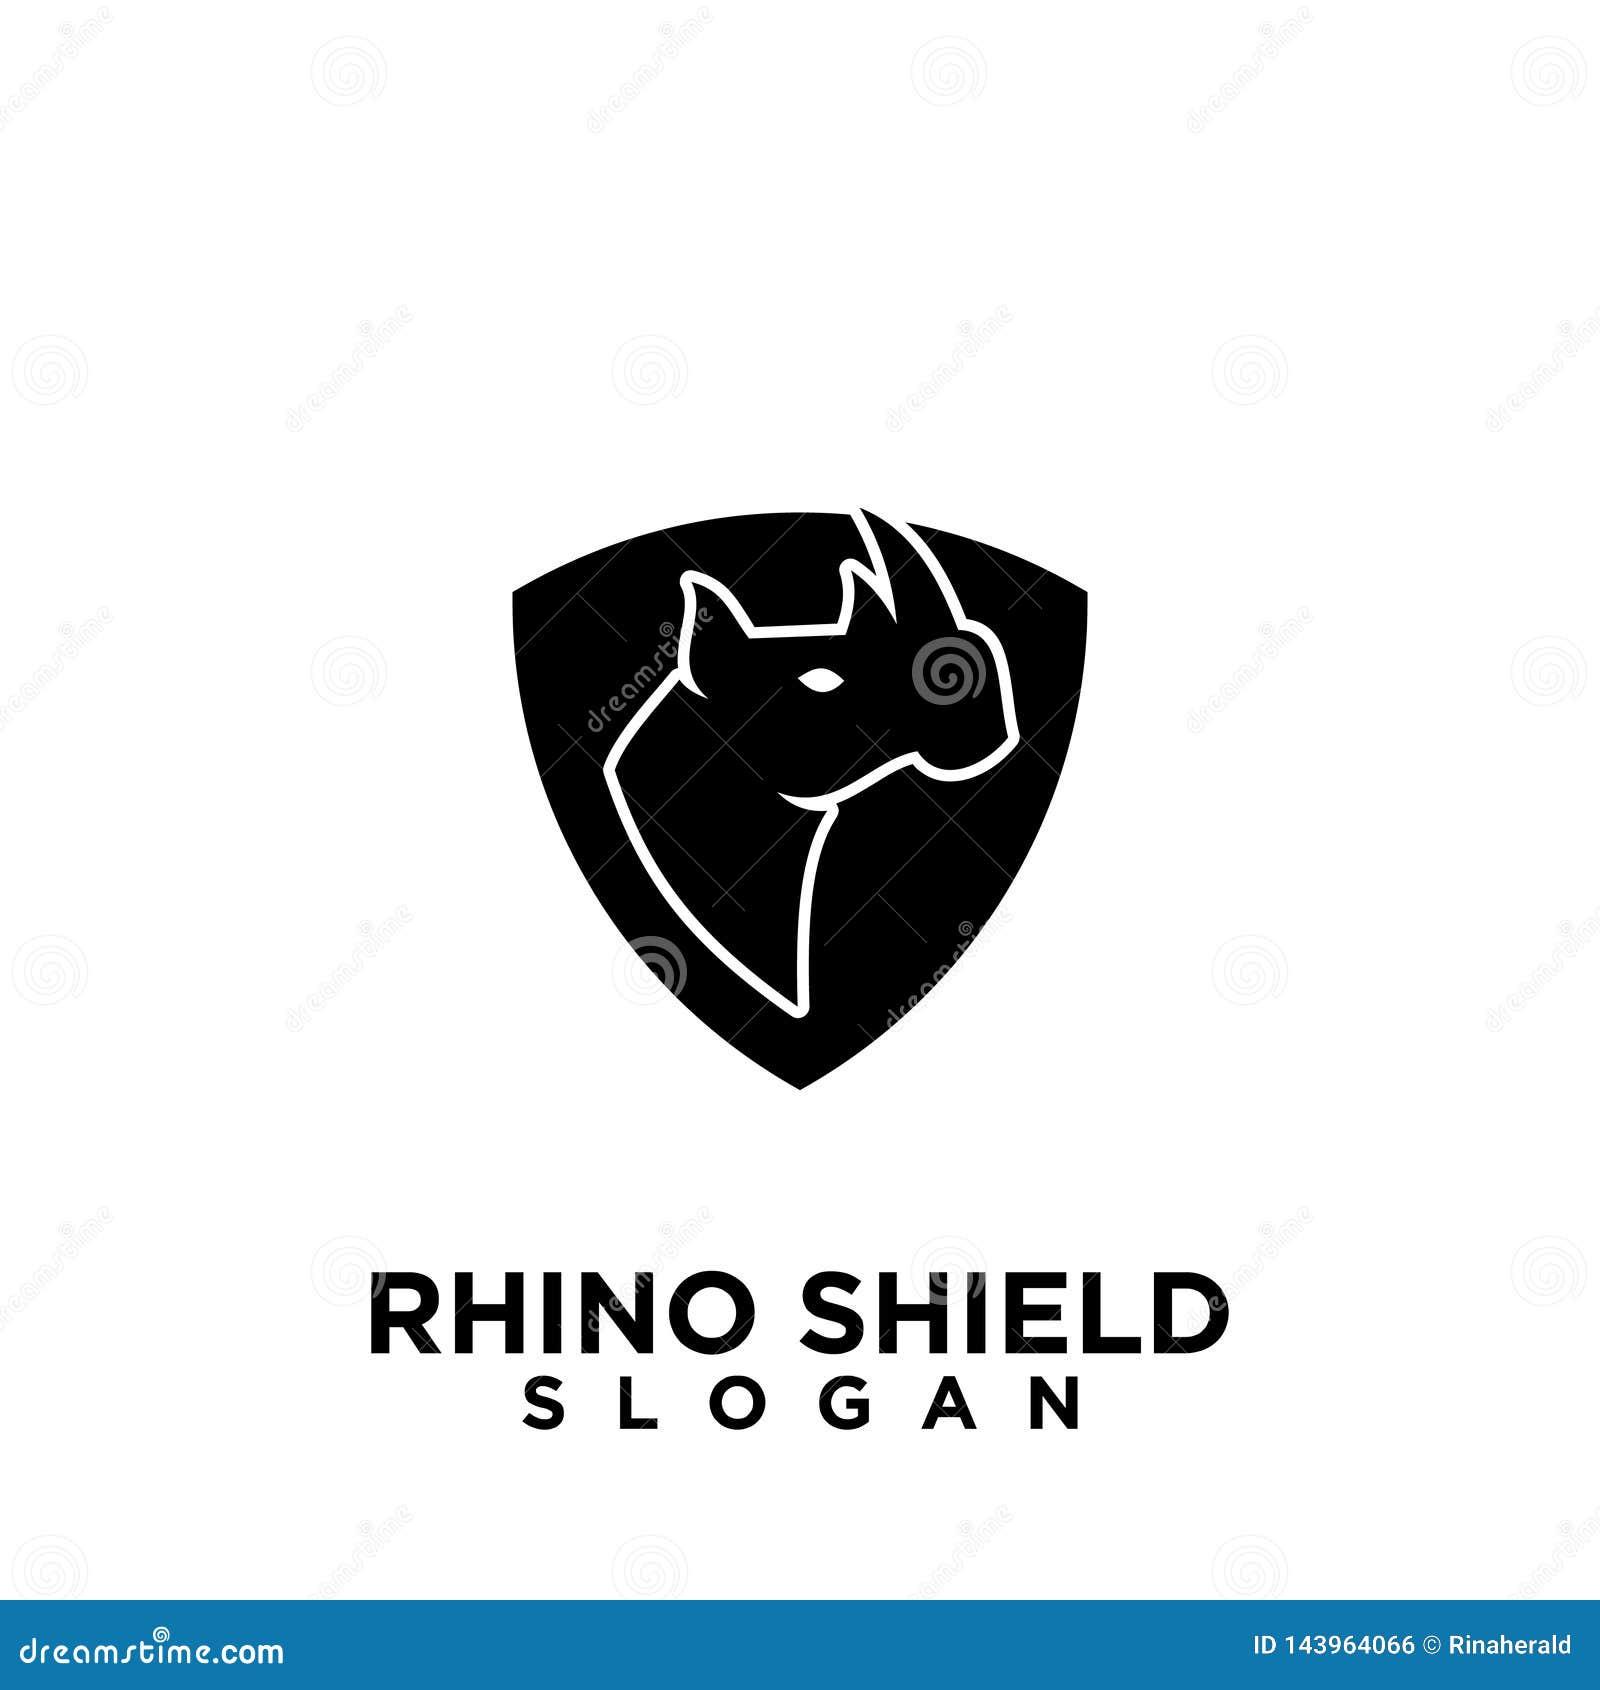 Rhino black shield logo icon designs vector illustration animal save protection